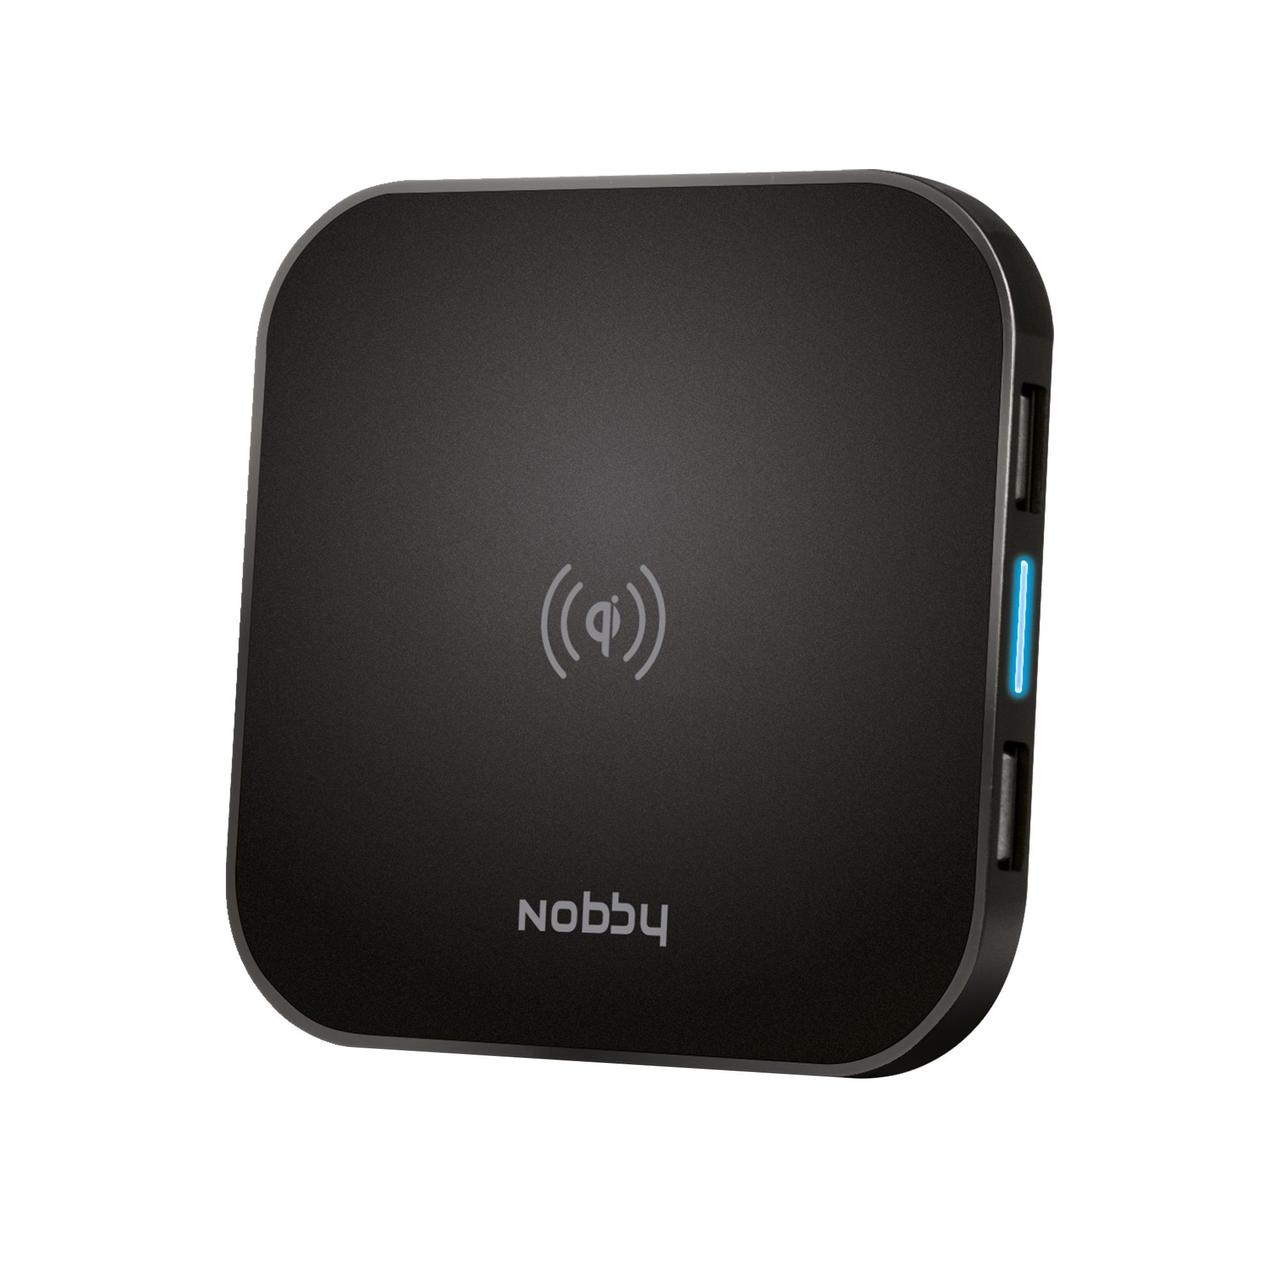 Беспроводное зарядное устройство Nobby Practic, черное (артикул 21121.30)